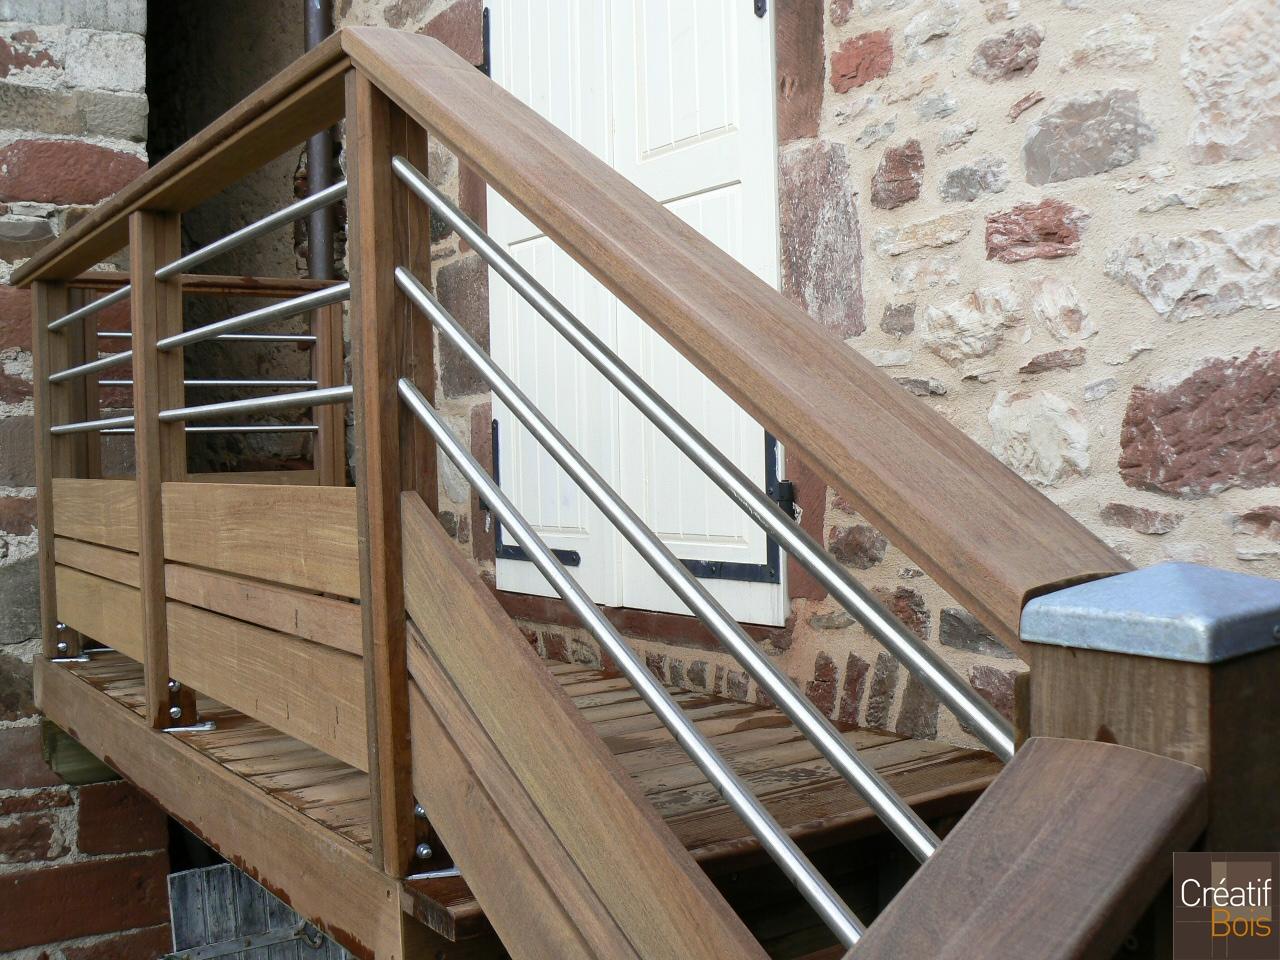 Escalier bois avec garde corps inox et bois meyssac for Balustrade en bois interieur